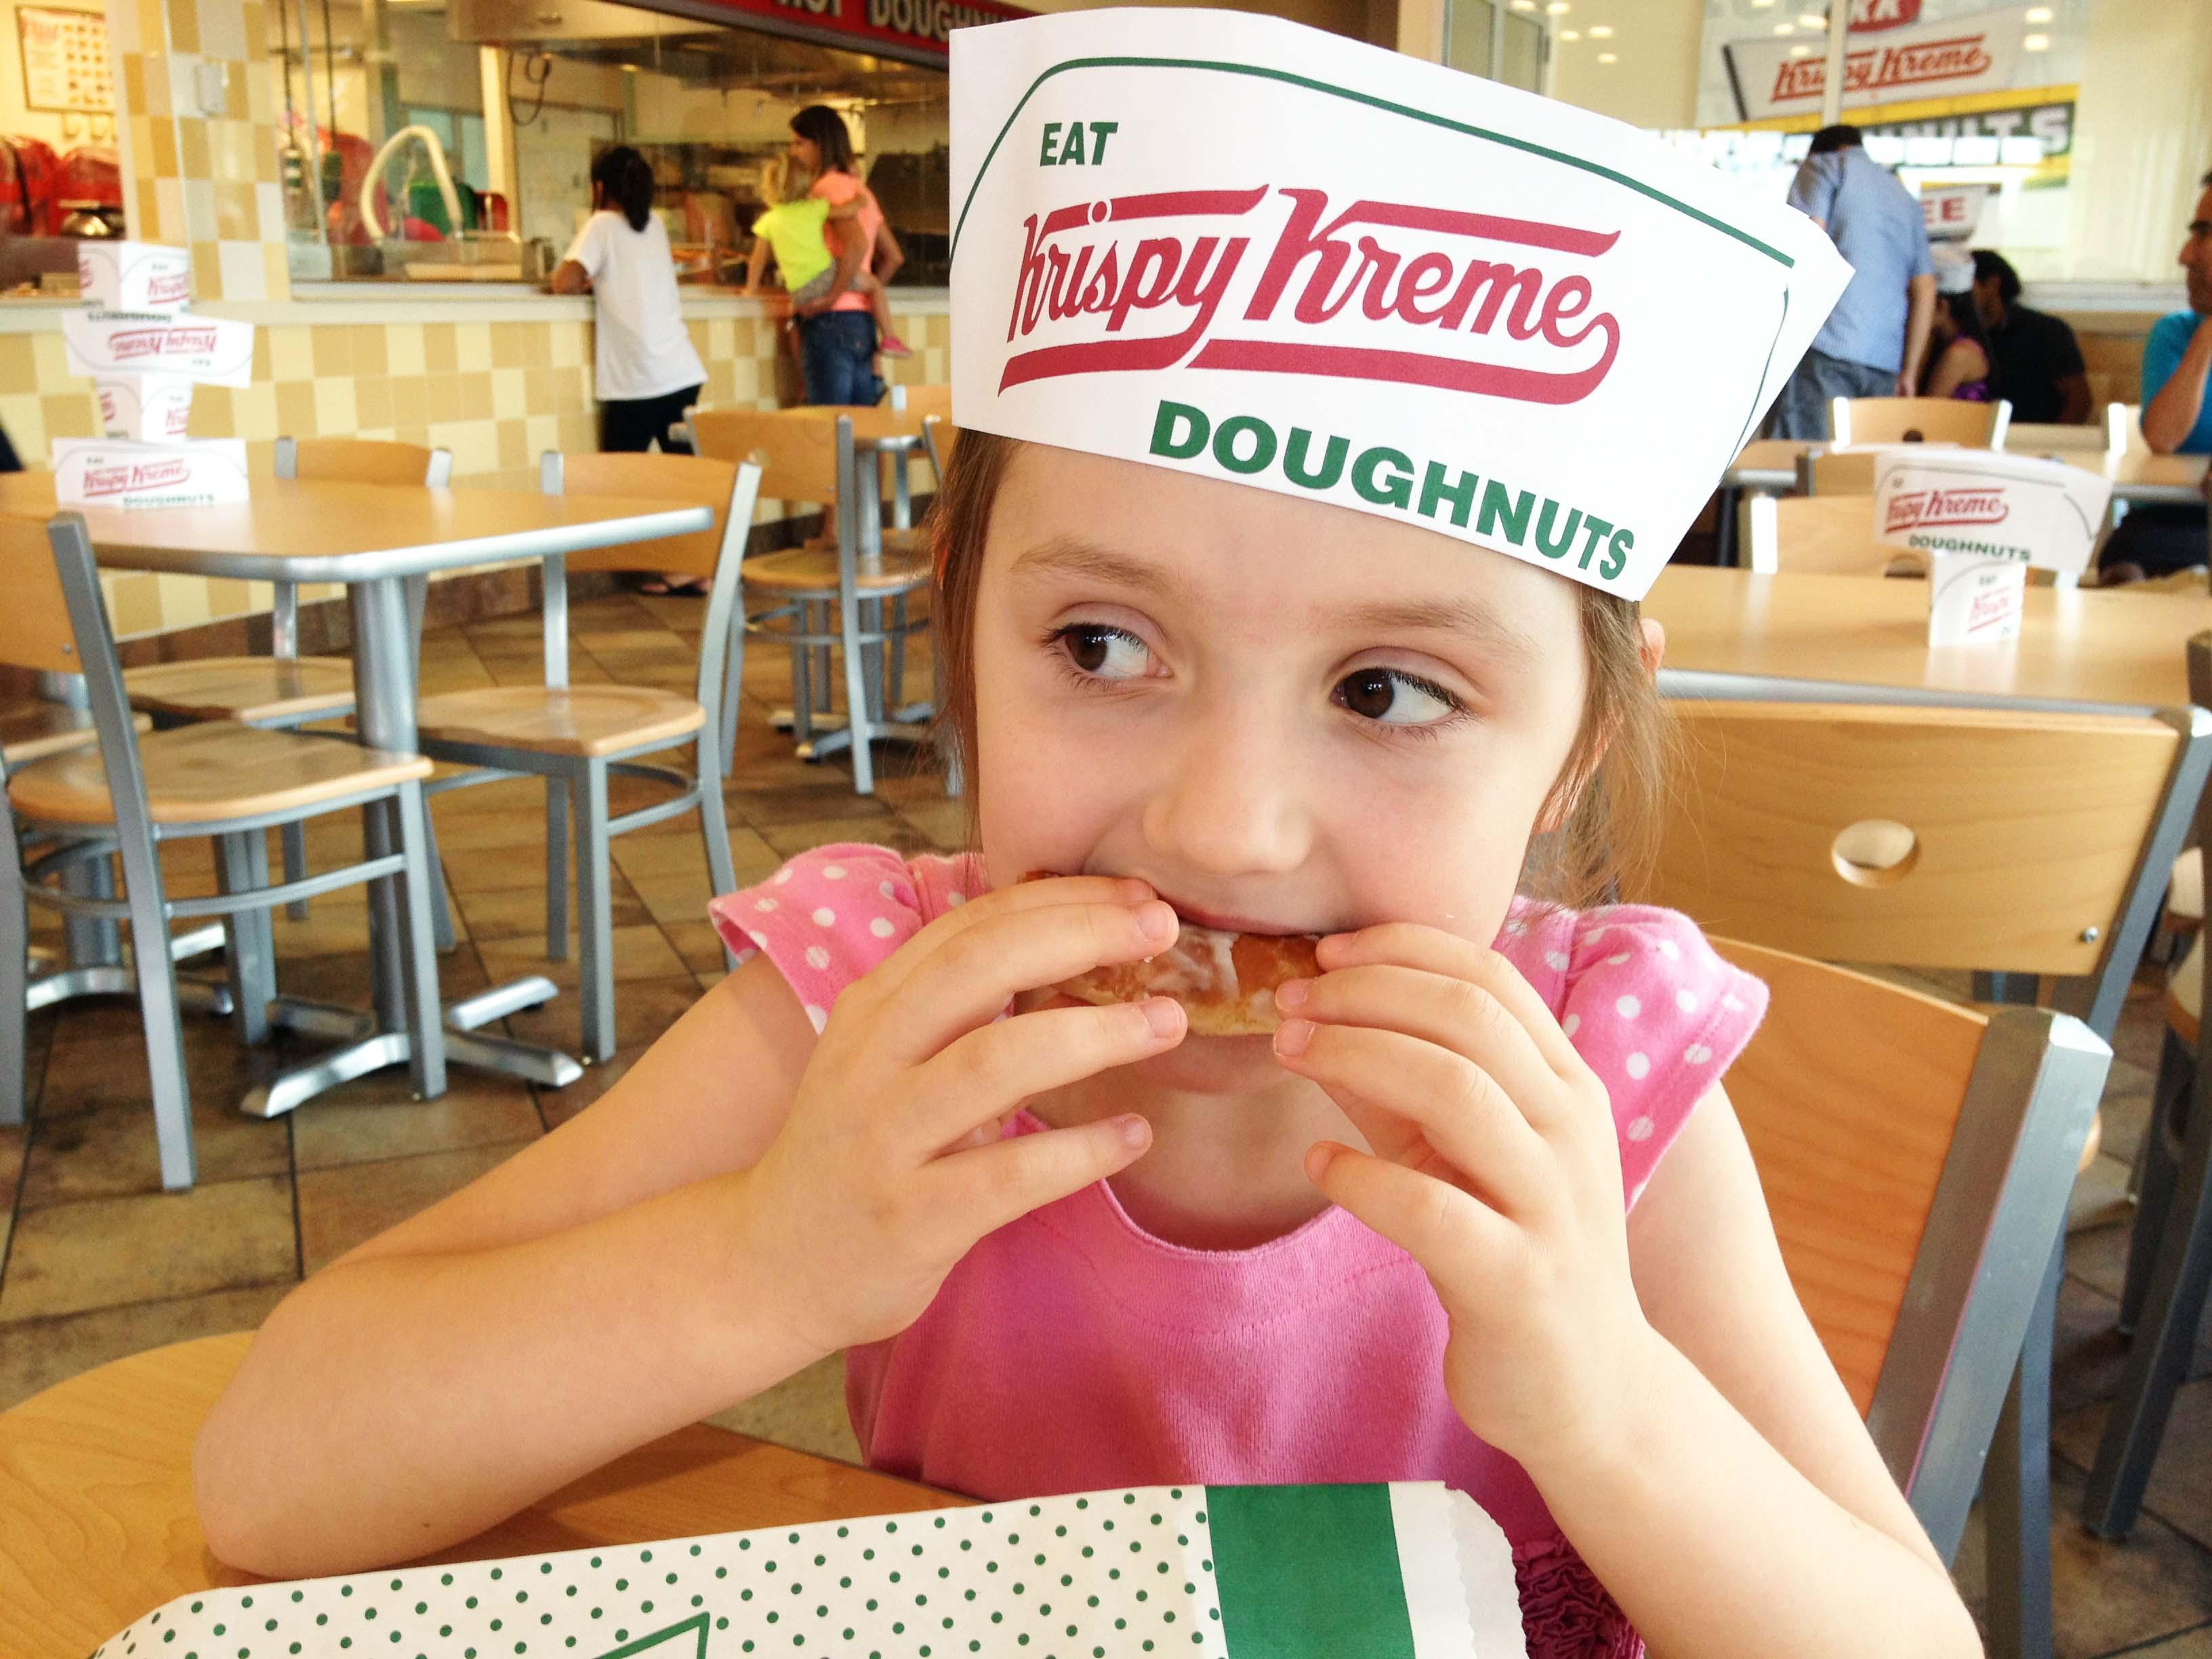 Fluffy eats a Krispy Kreme